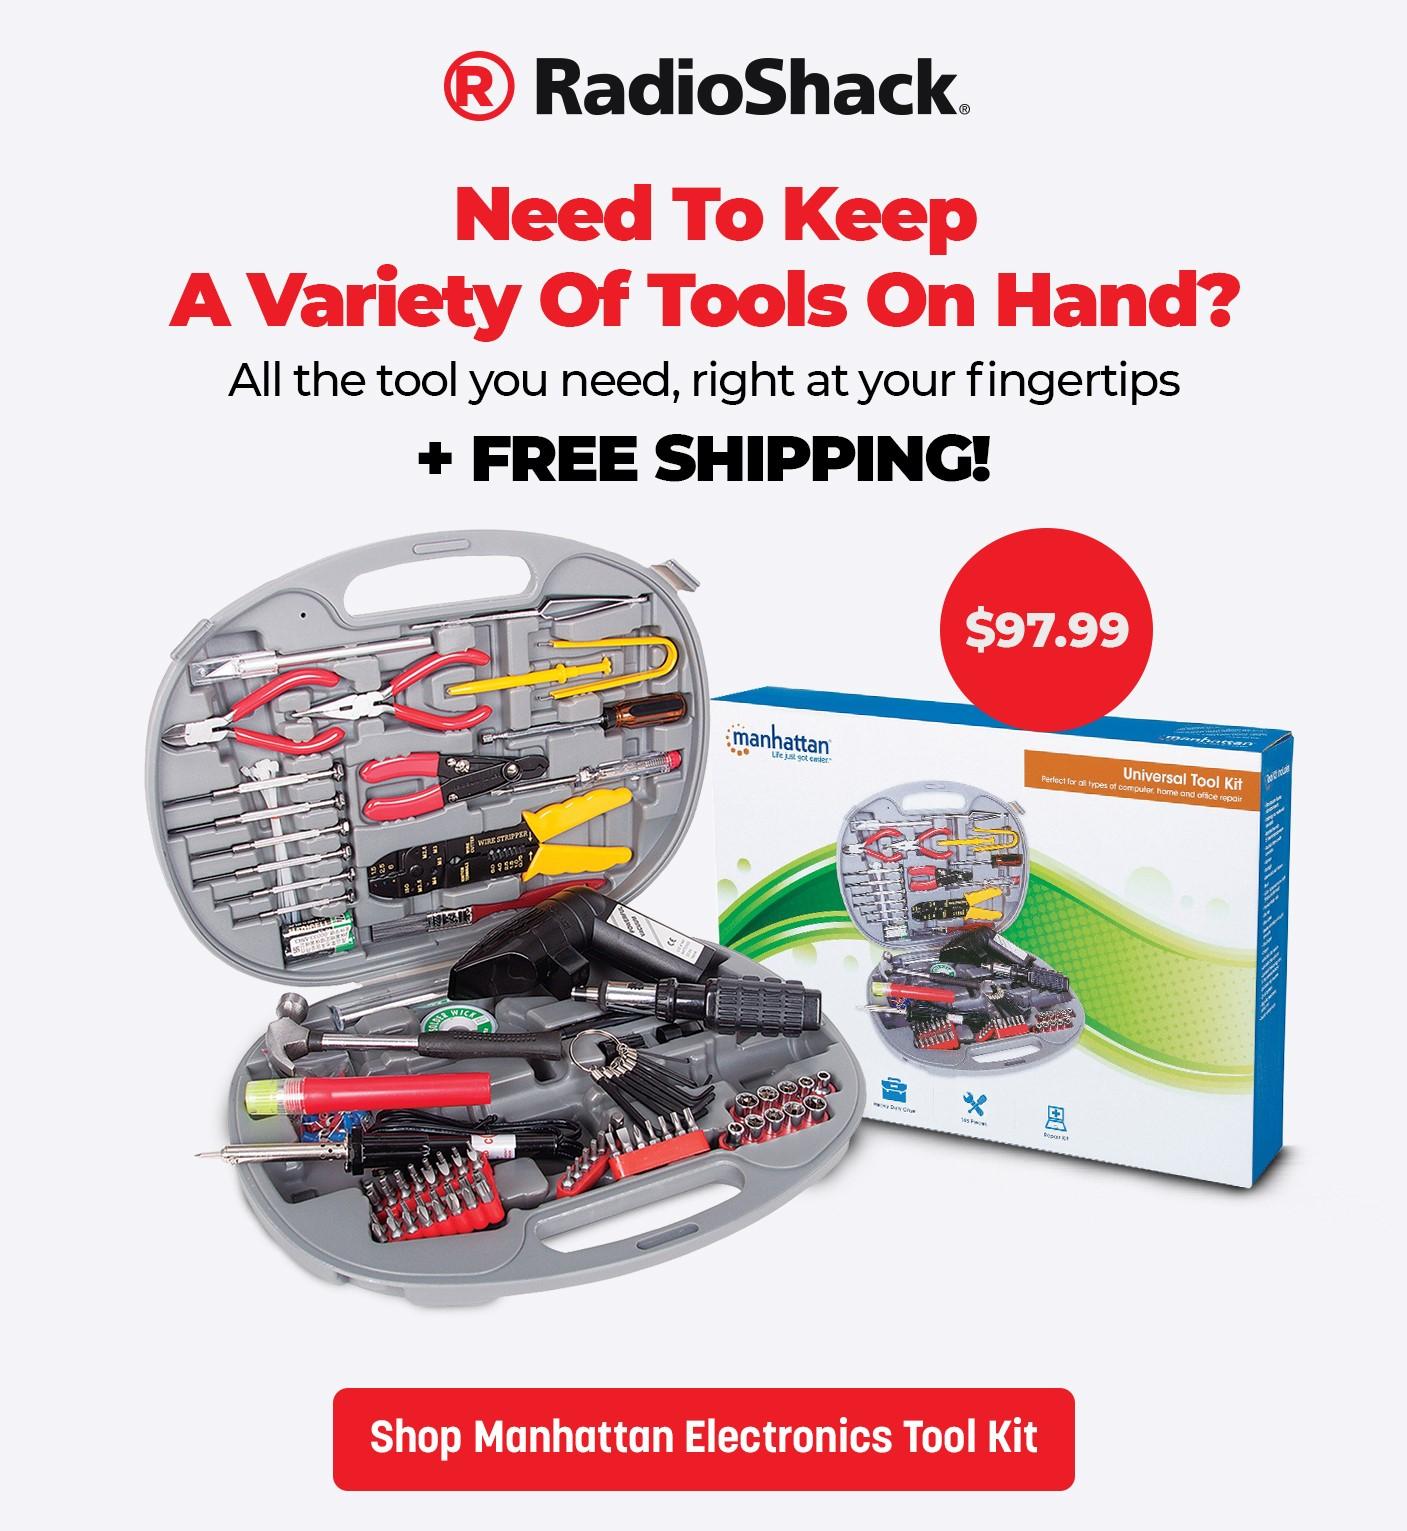 Manhattan 145-Piece Electronics Tool Kit with Heavy-Duty Case